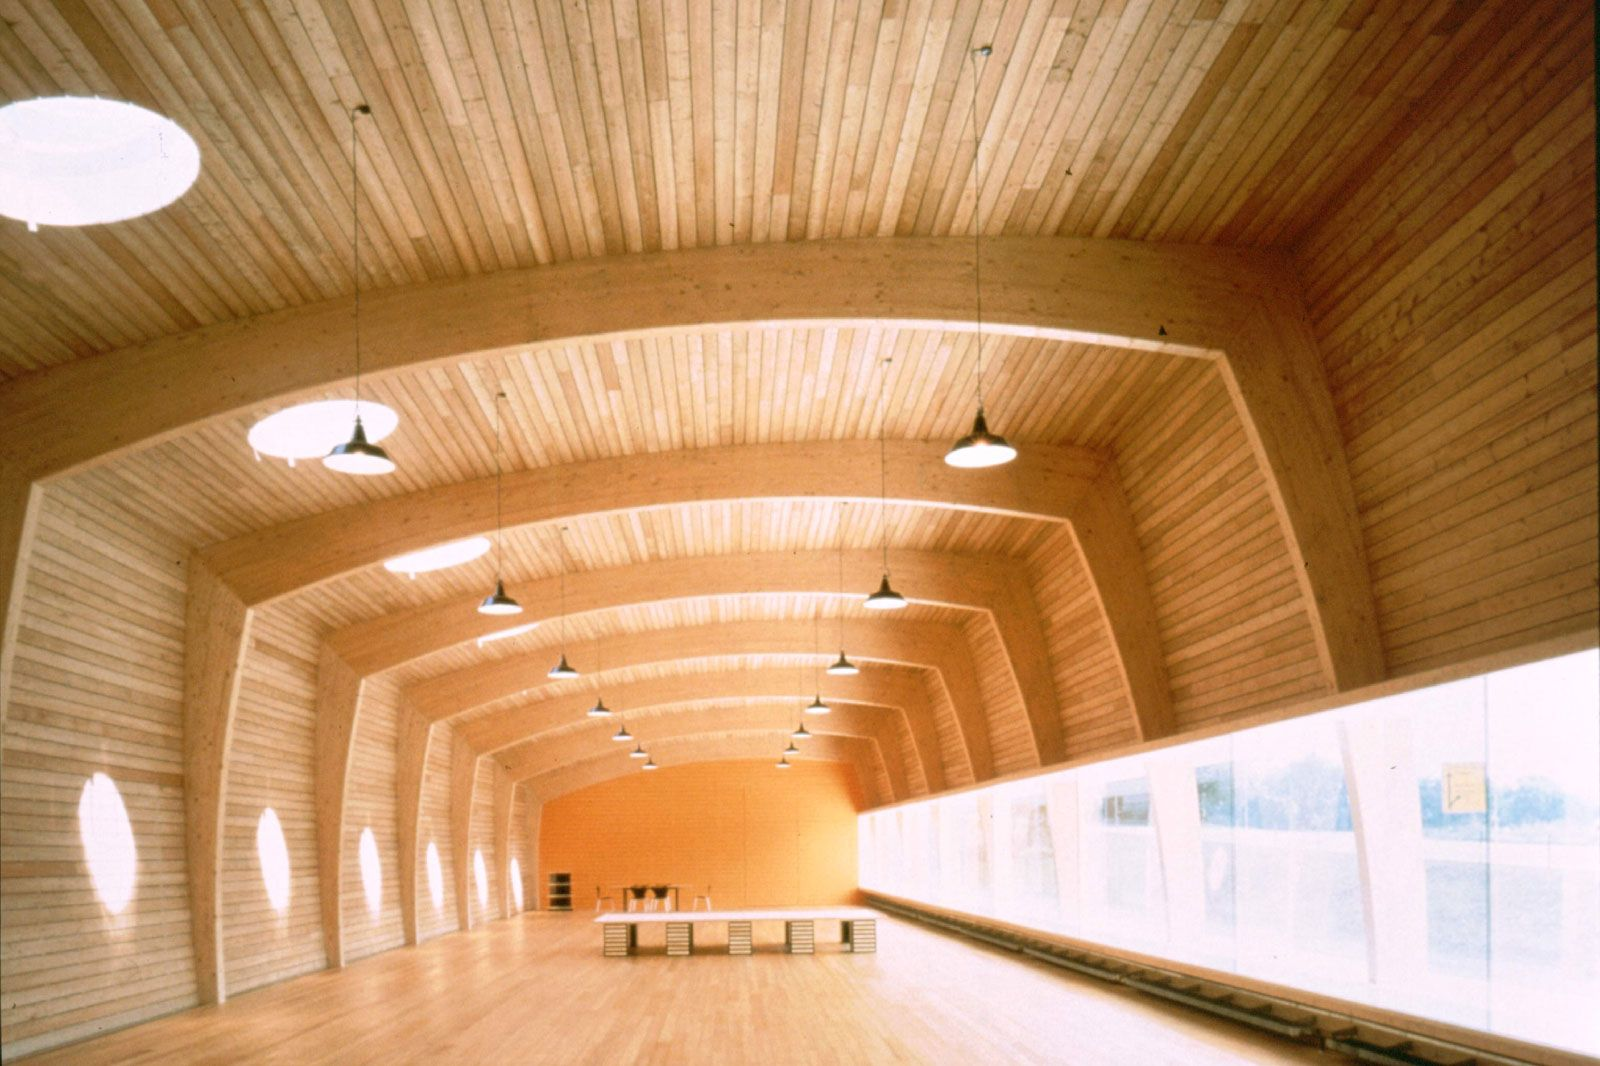 Vigas madera vigas laminadas almacen de maderas - Estructura madera laminada ...